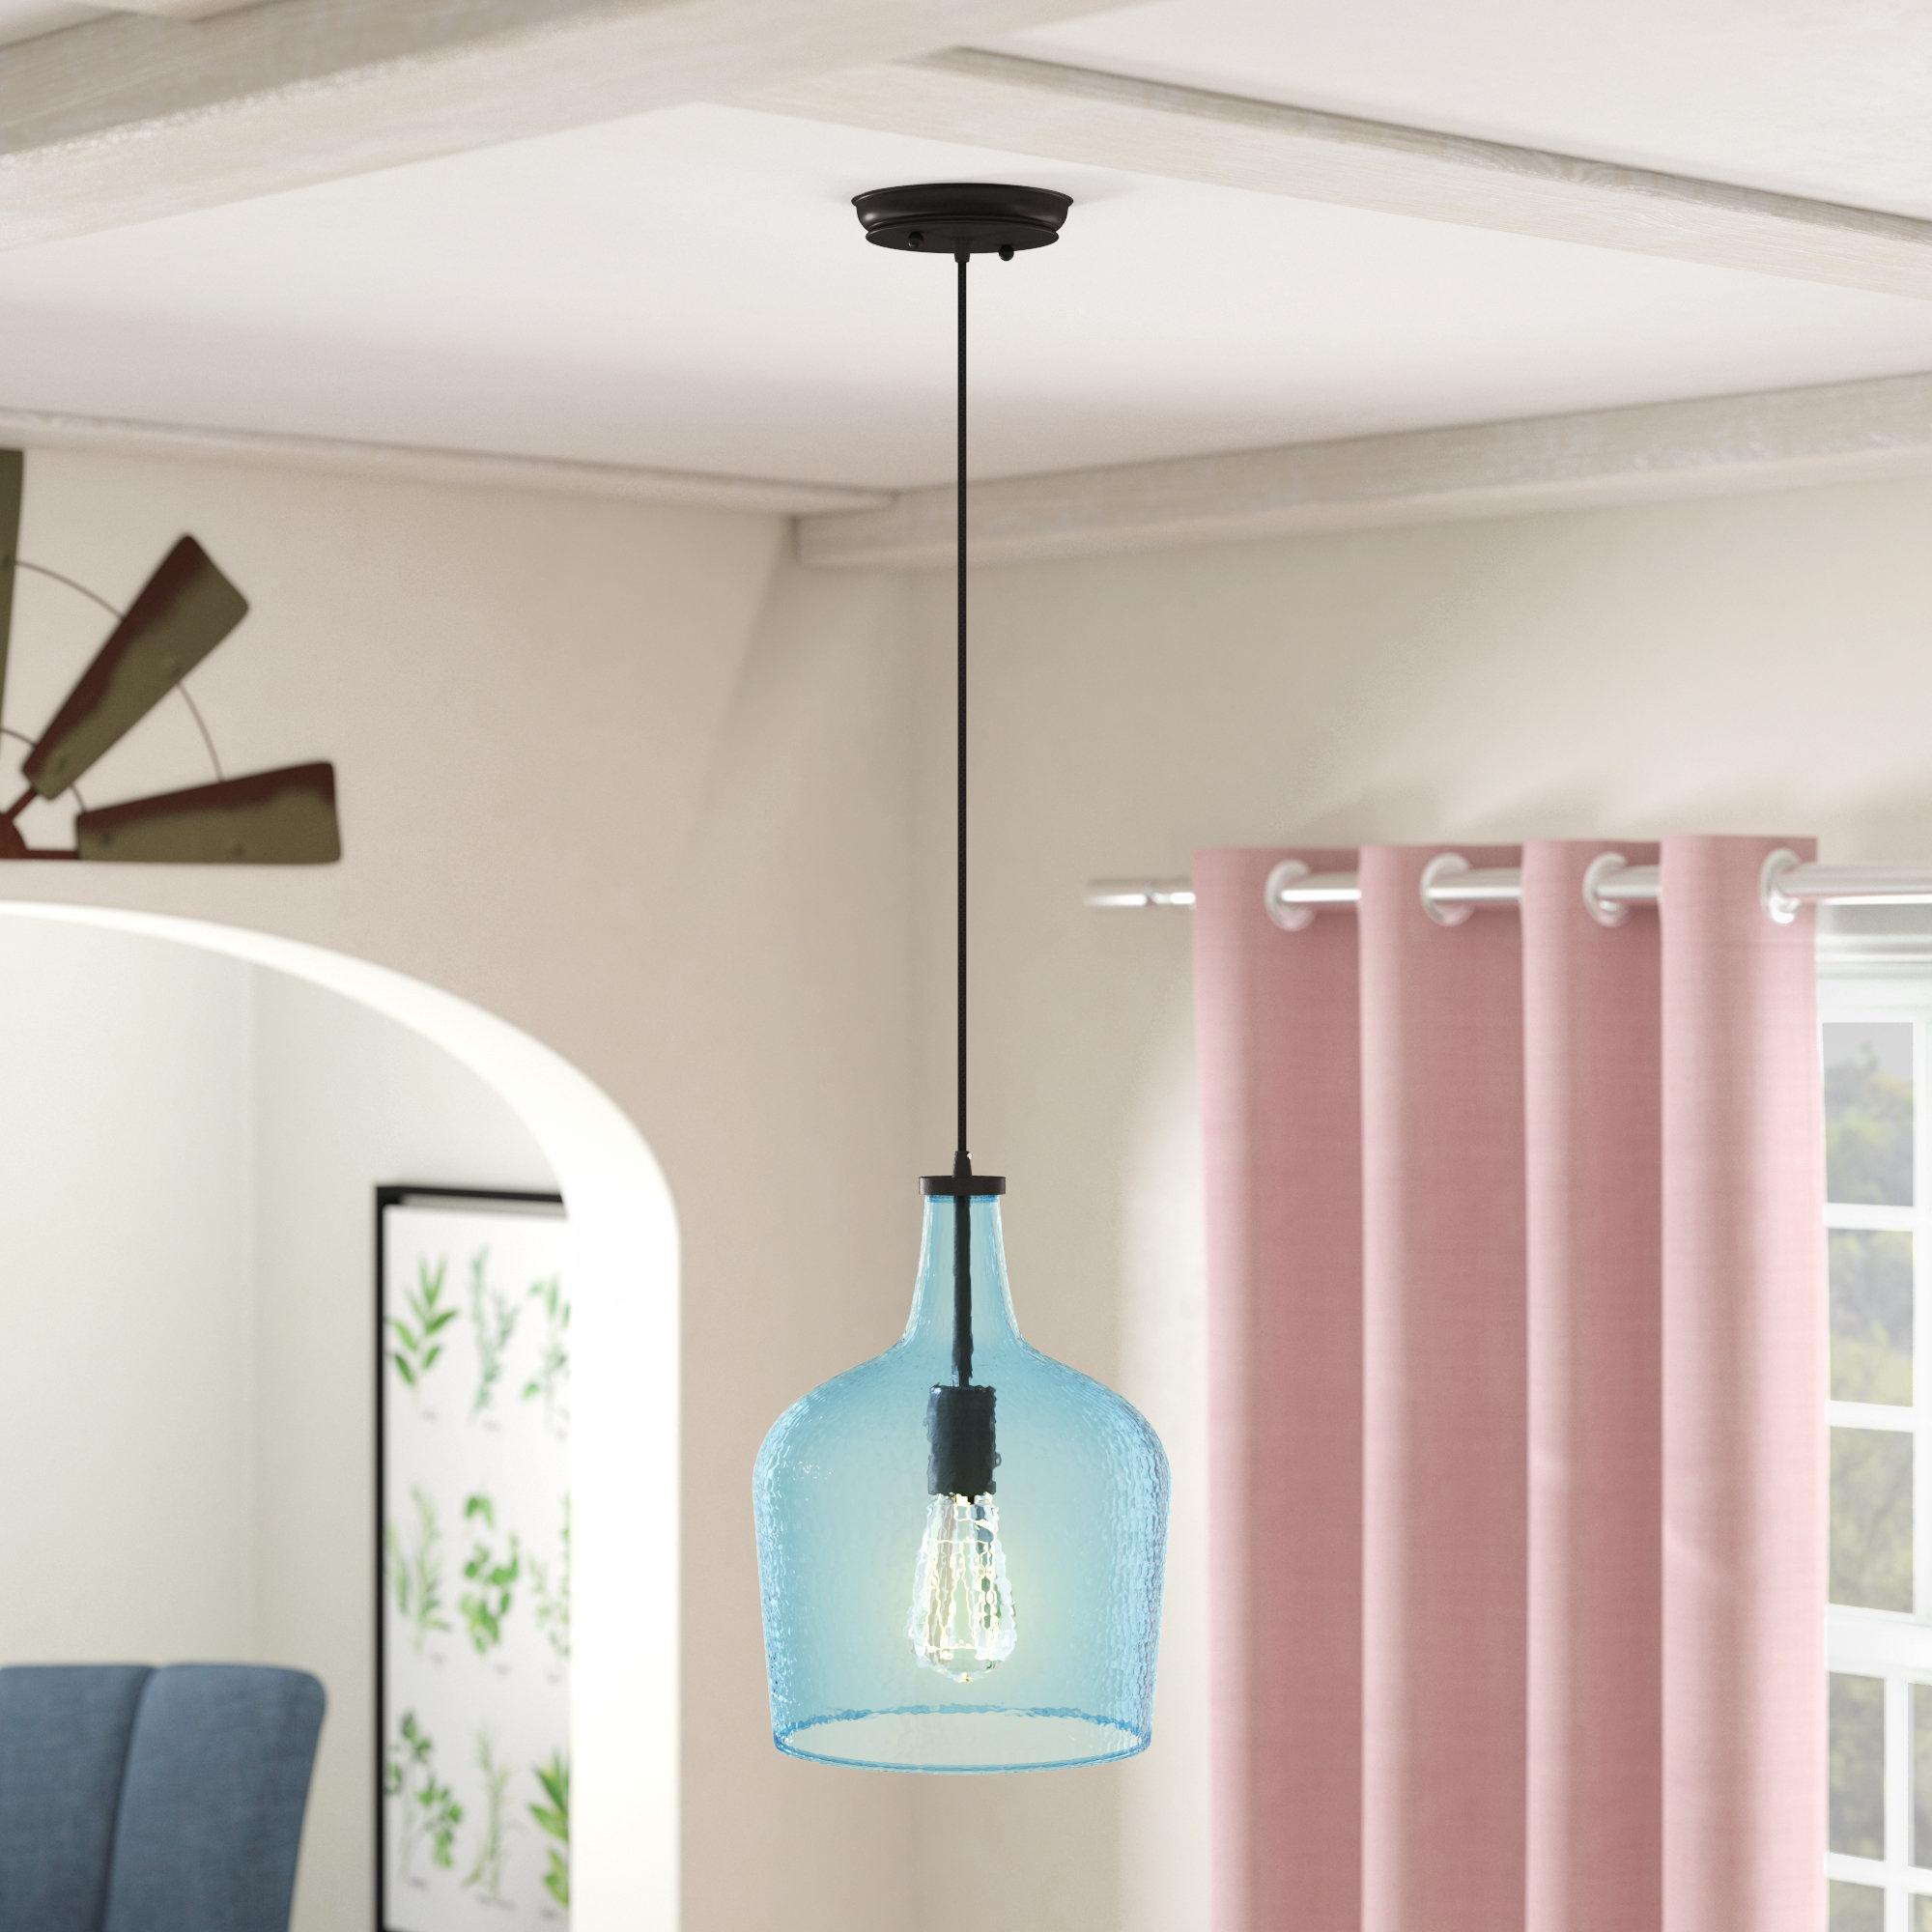 Scruggs 1 Light Single Bell Pendant Within 1 Light Single Bell Pendants (View 24 of 30)